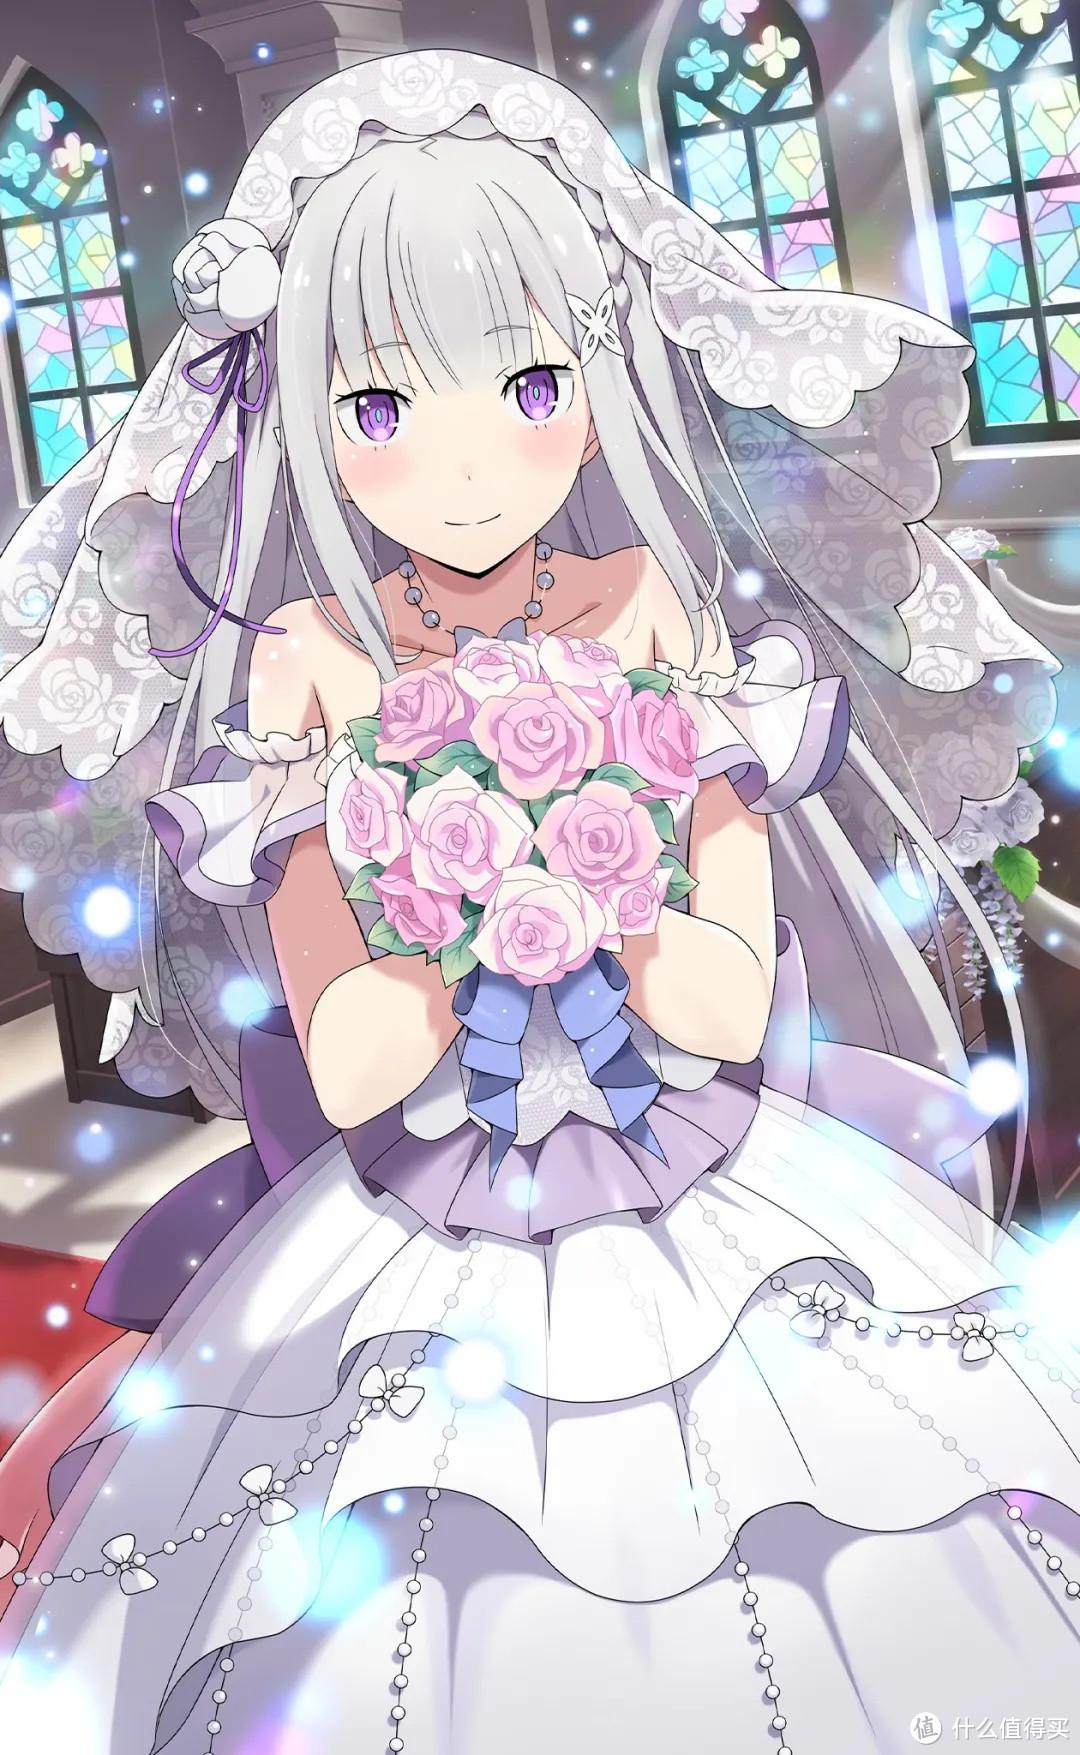 《Re:从零开始的异世界生活》爱蜜莉雅终于穿上婚纱!新展开!